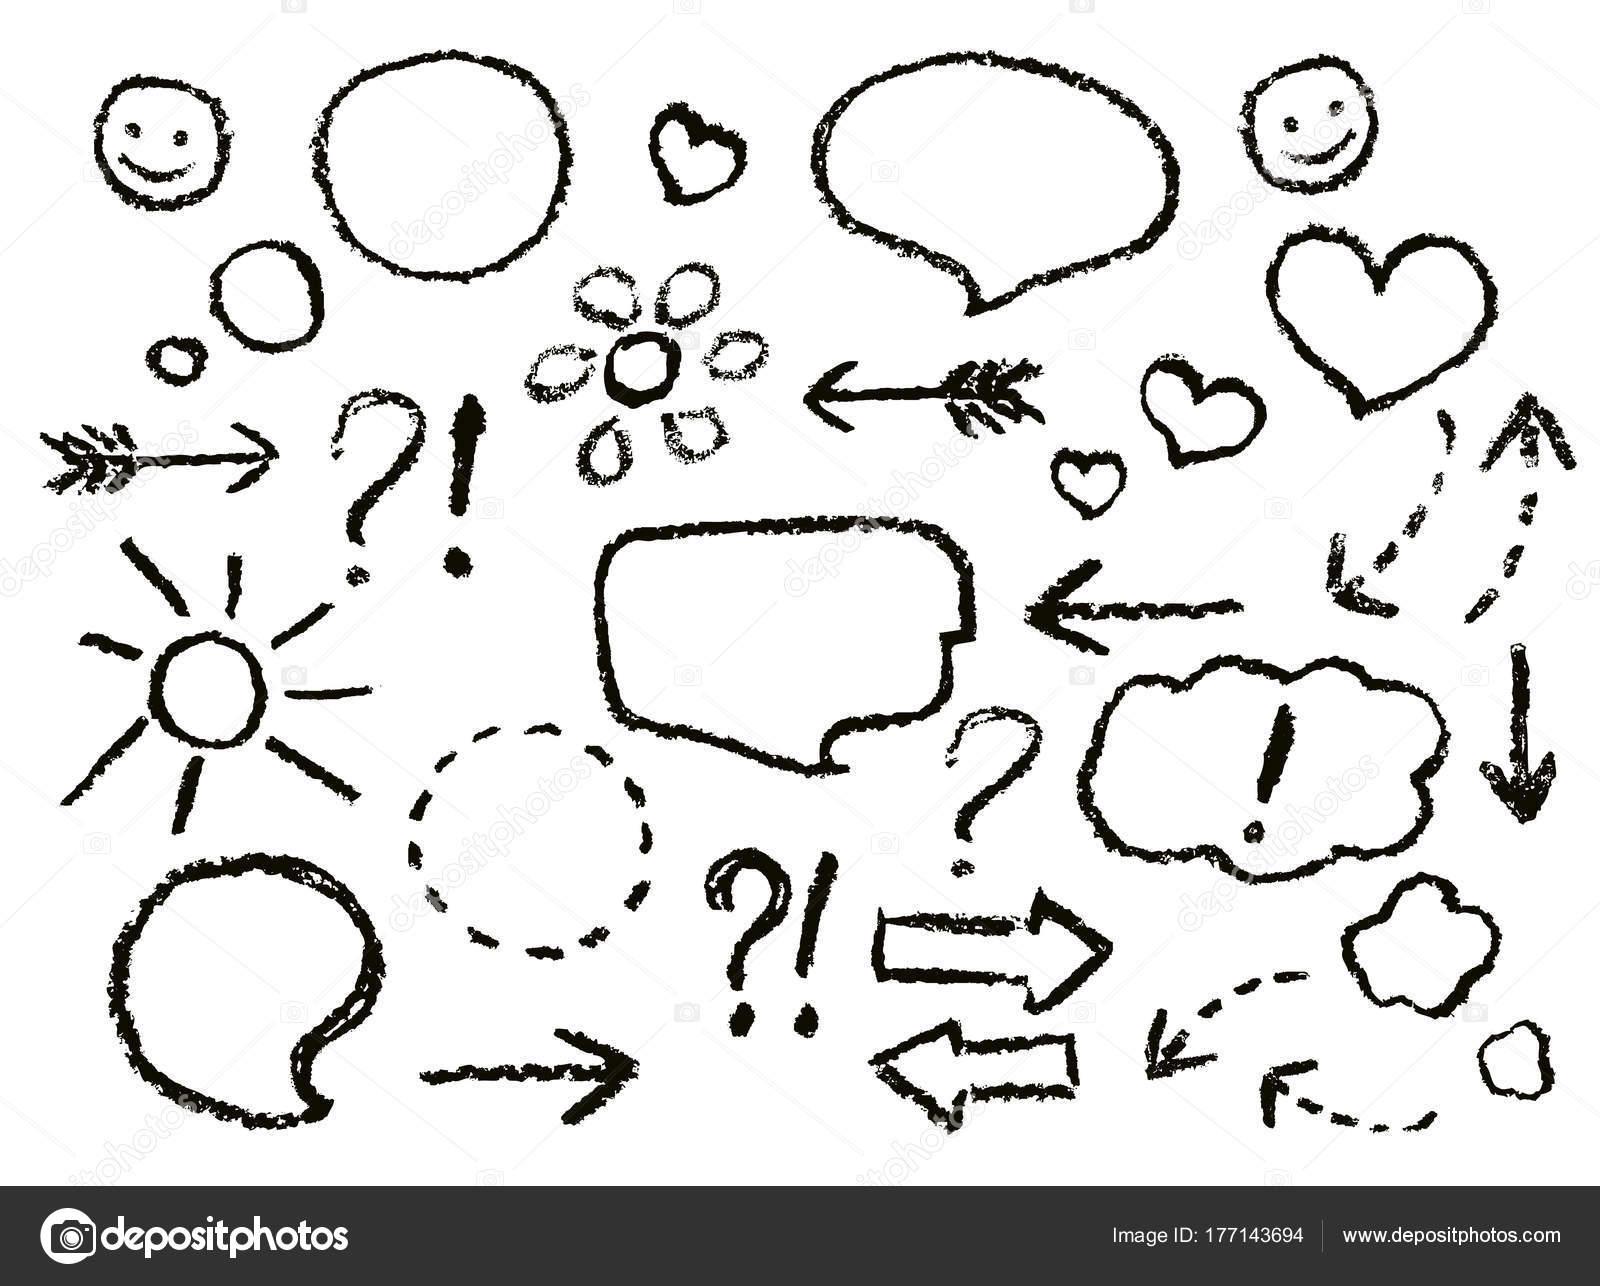 1600x1286 Drawing Speech Bubbles Crayon Arrows Heart Shape Smile Sign